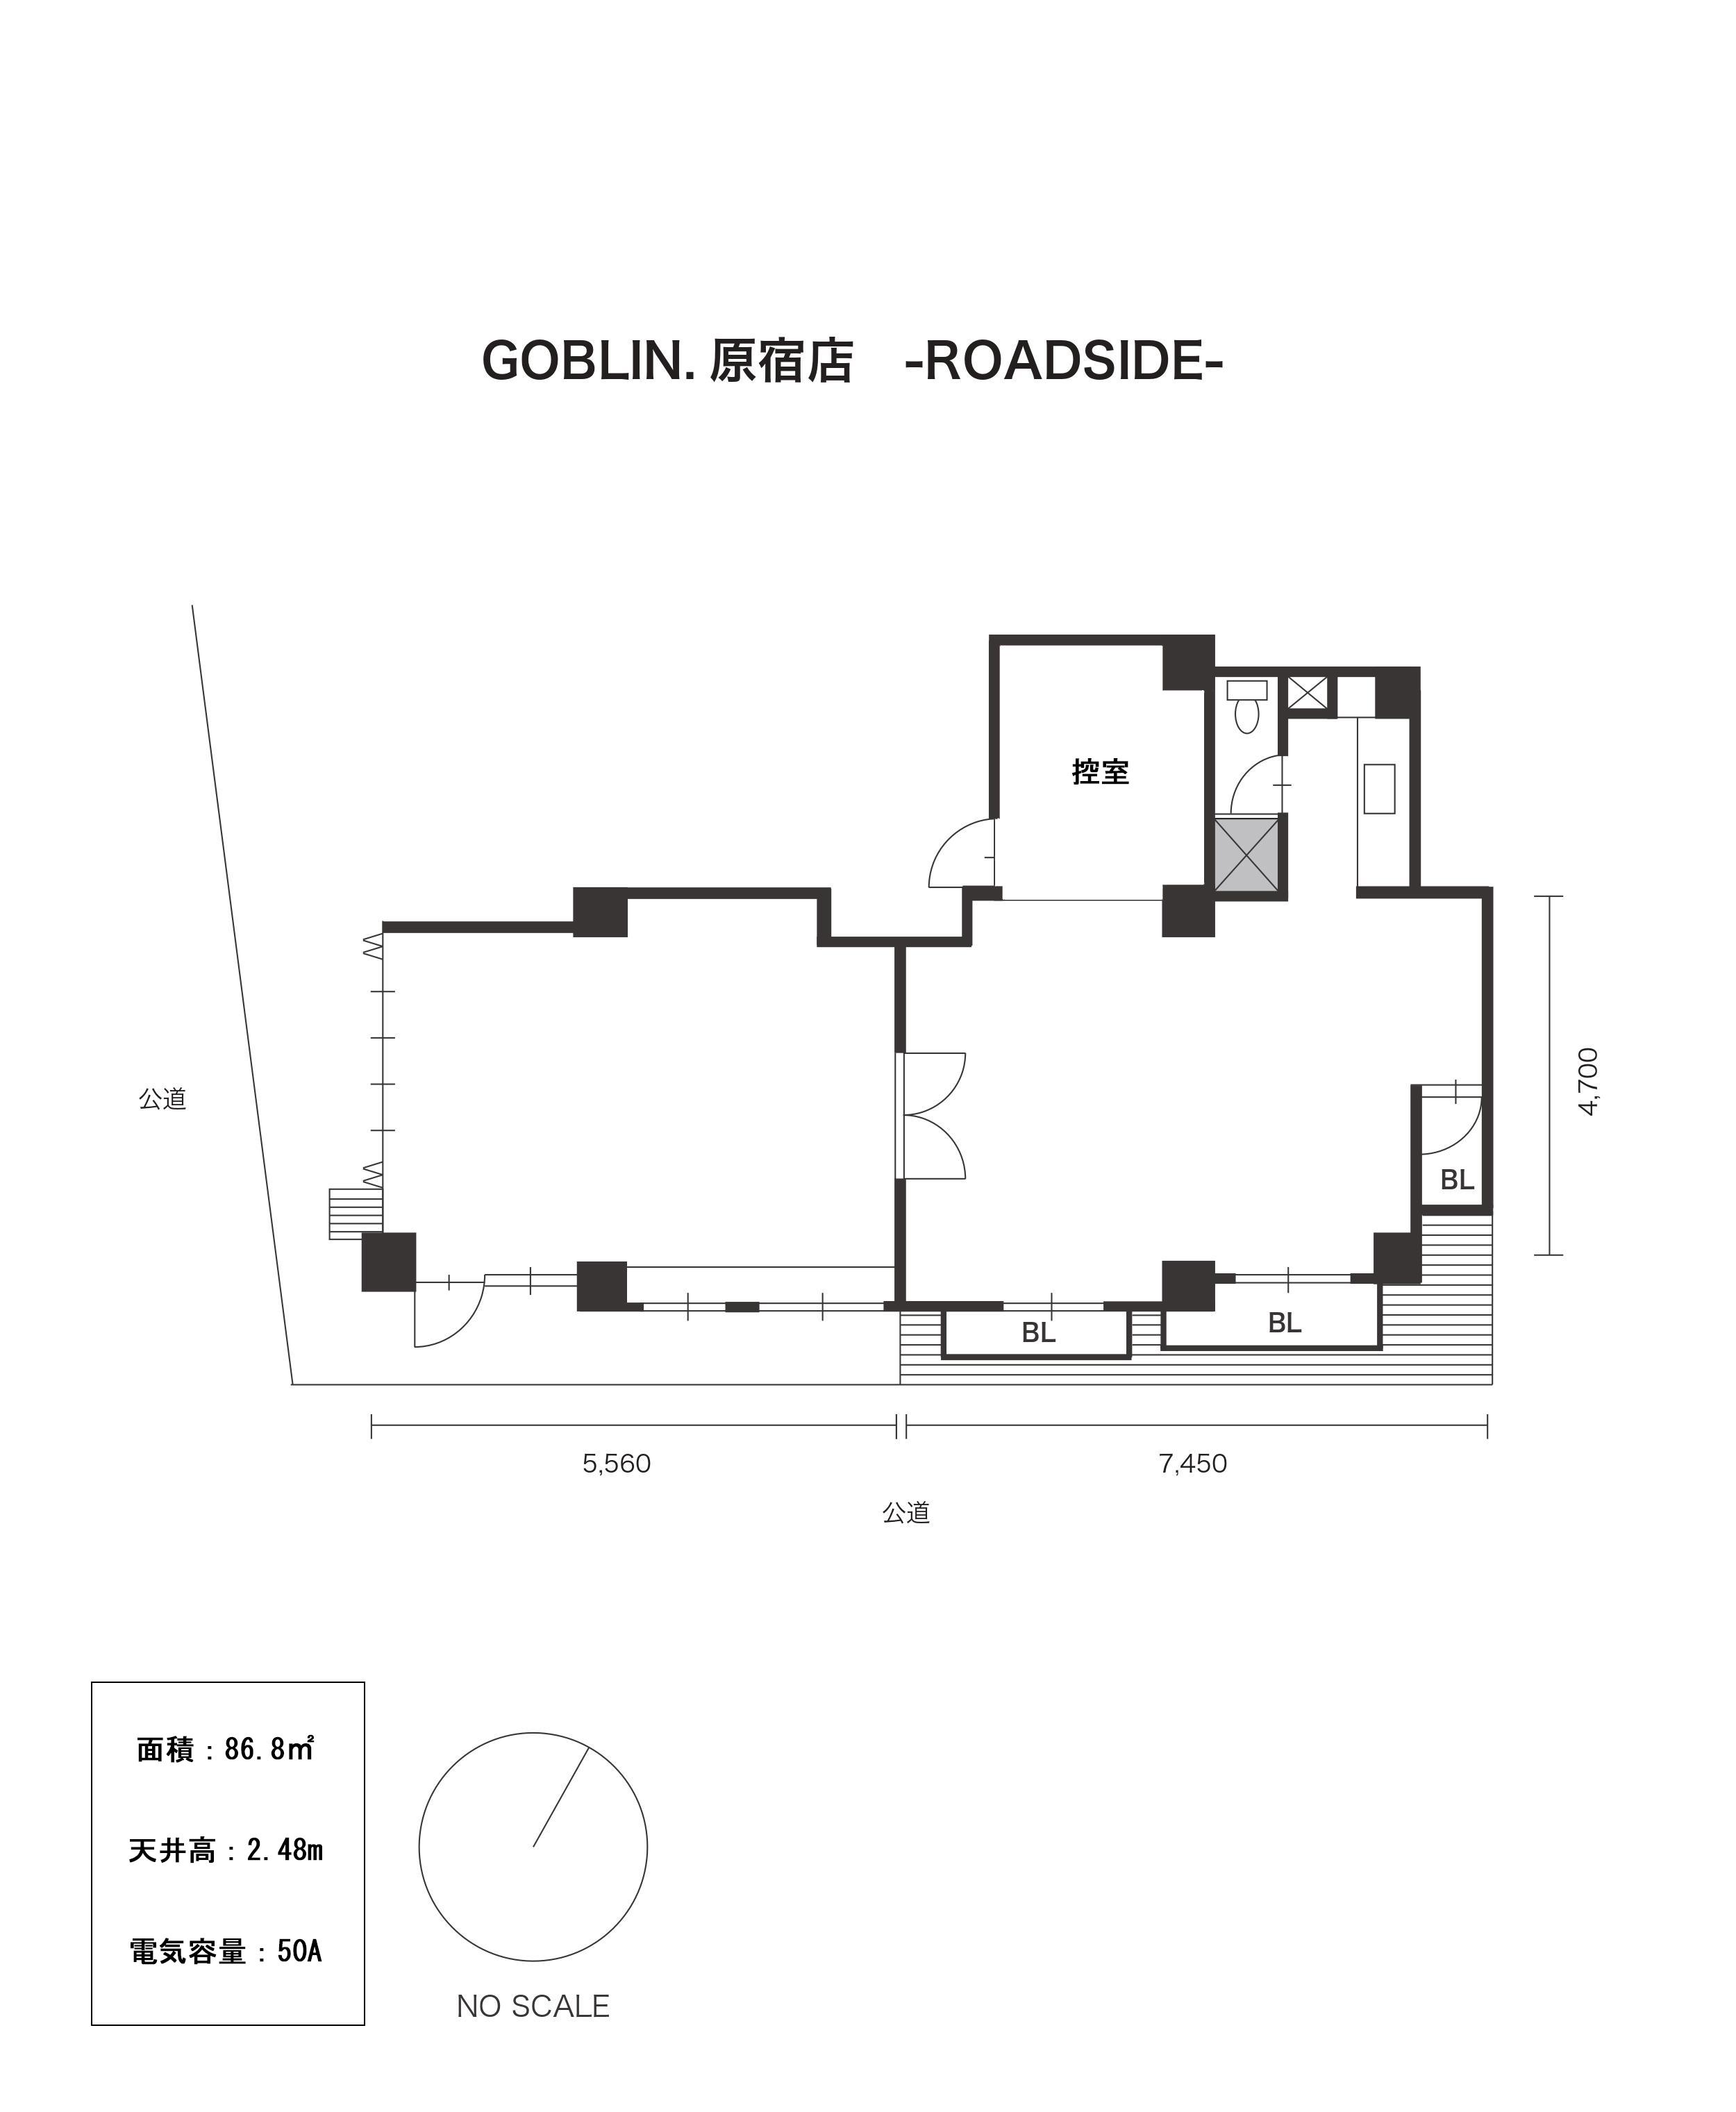 GOBLIN.原宿-ROADSIDE- (ID:10060) 図面|TIME SHARING|タイムシェアリング |スペースマネジメント|あどばる|adval